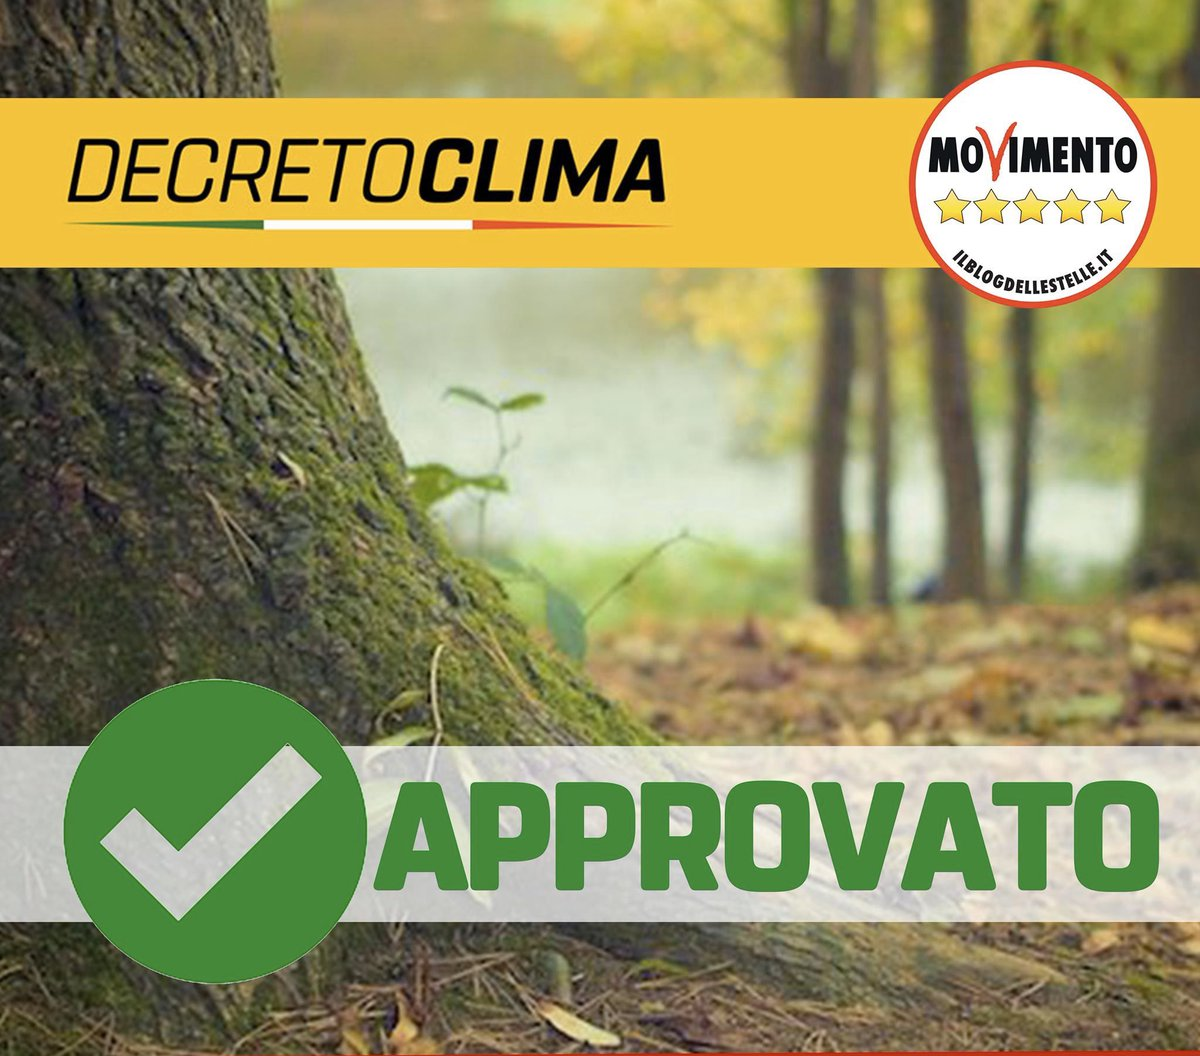 #DecretoClima